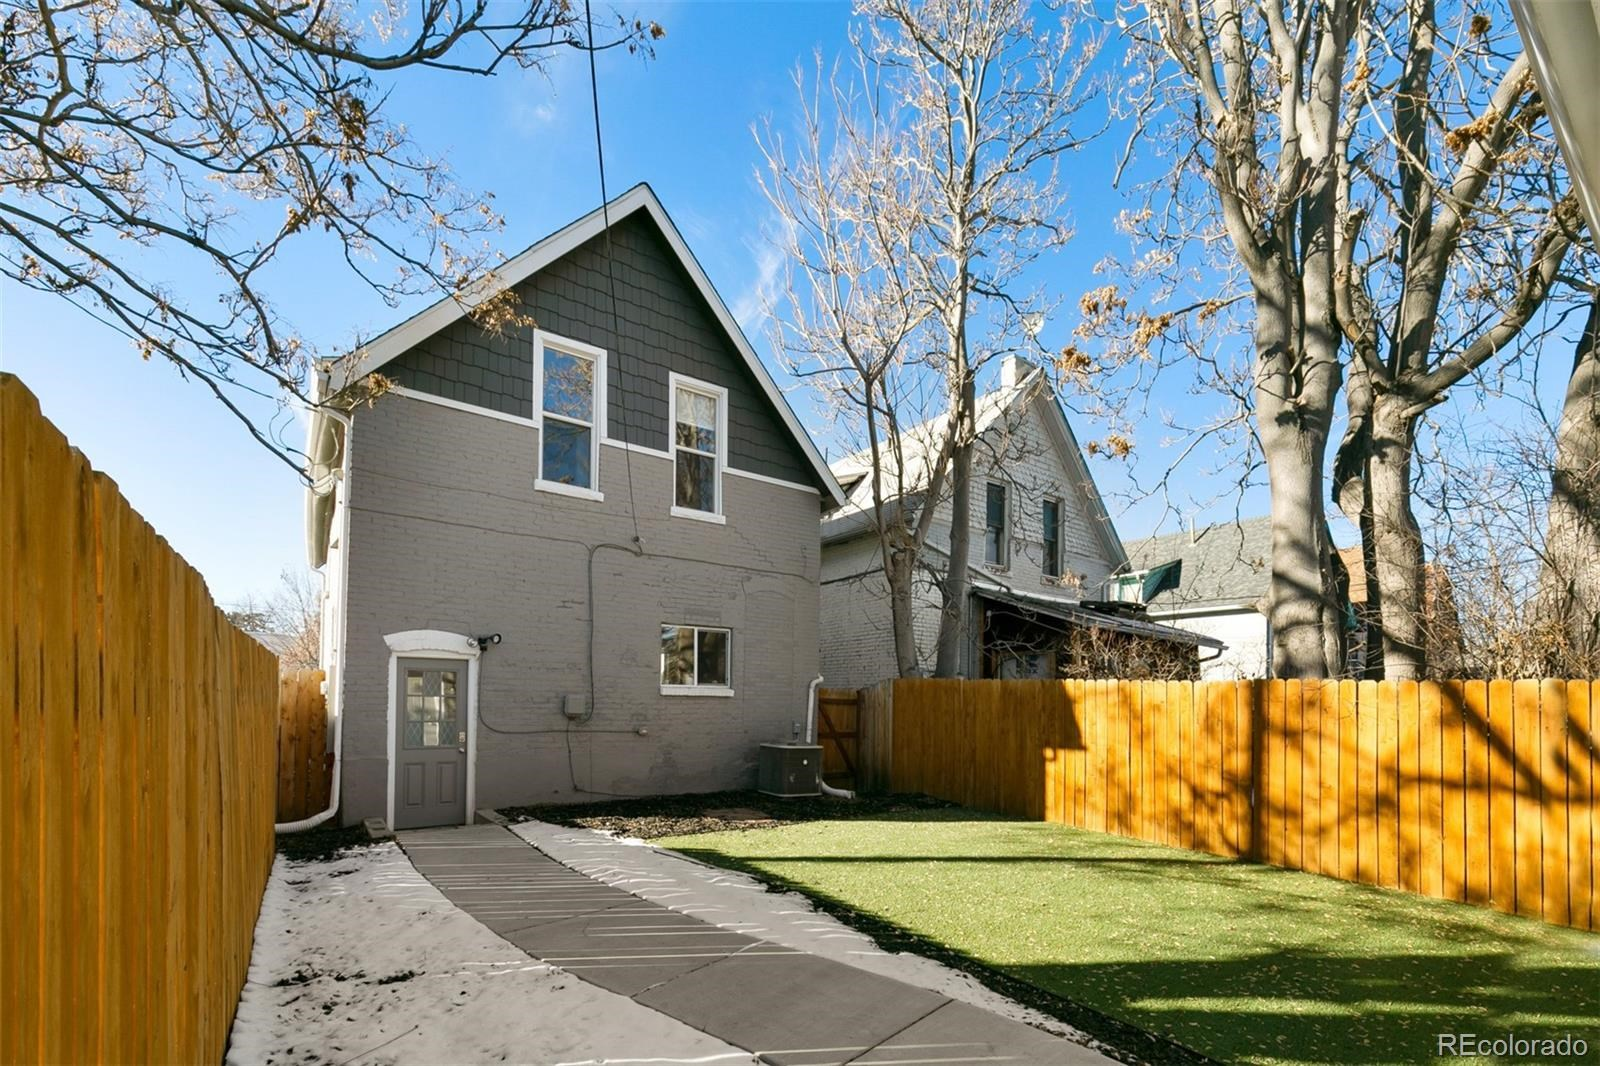 MLS# 7644495 - 28 - 2816 N High Street, Denver, CO 80205